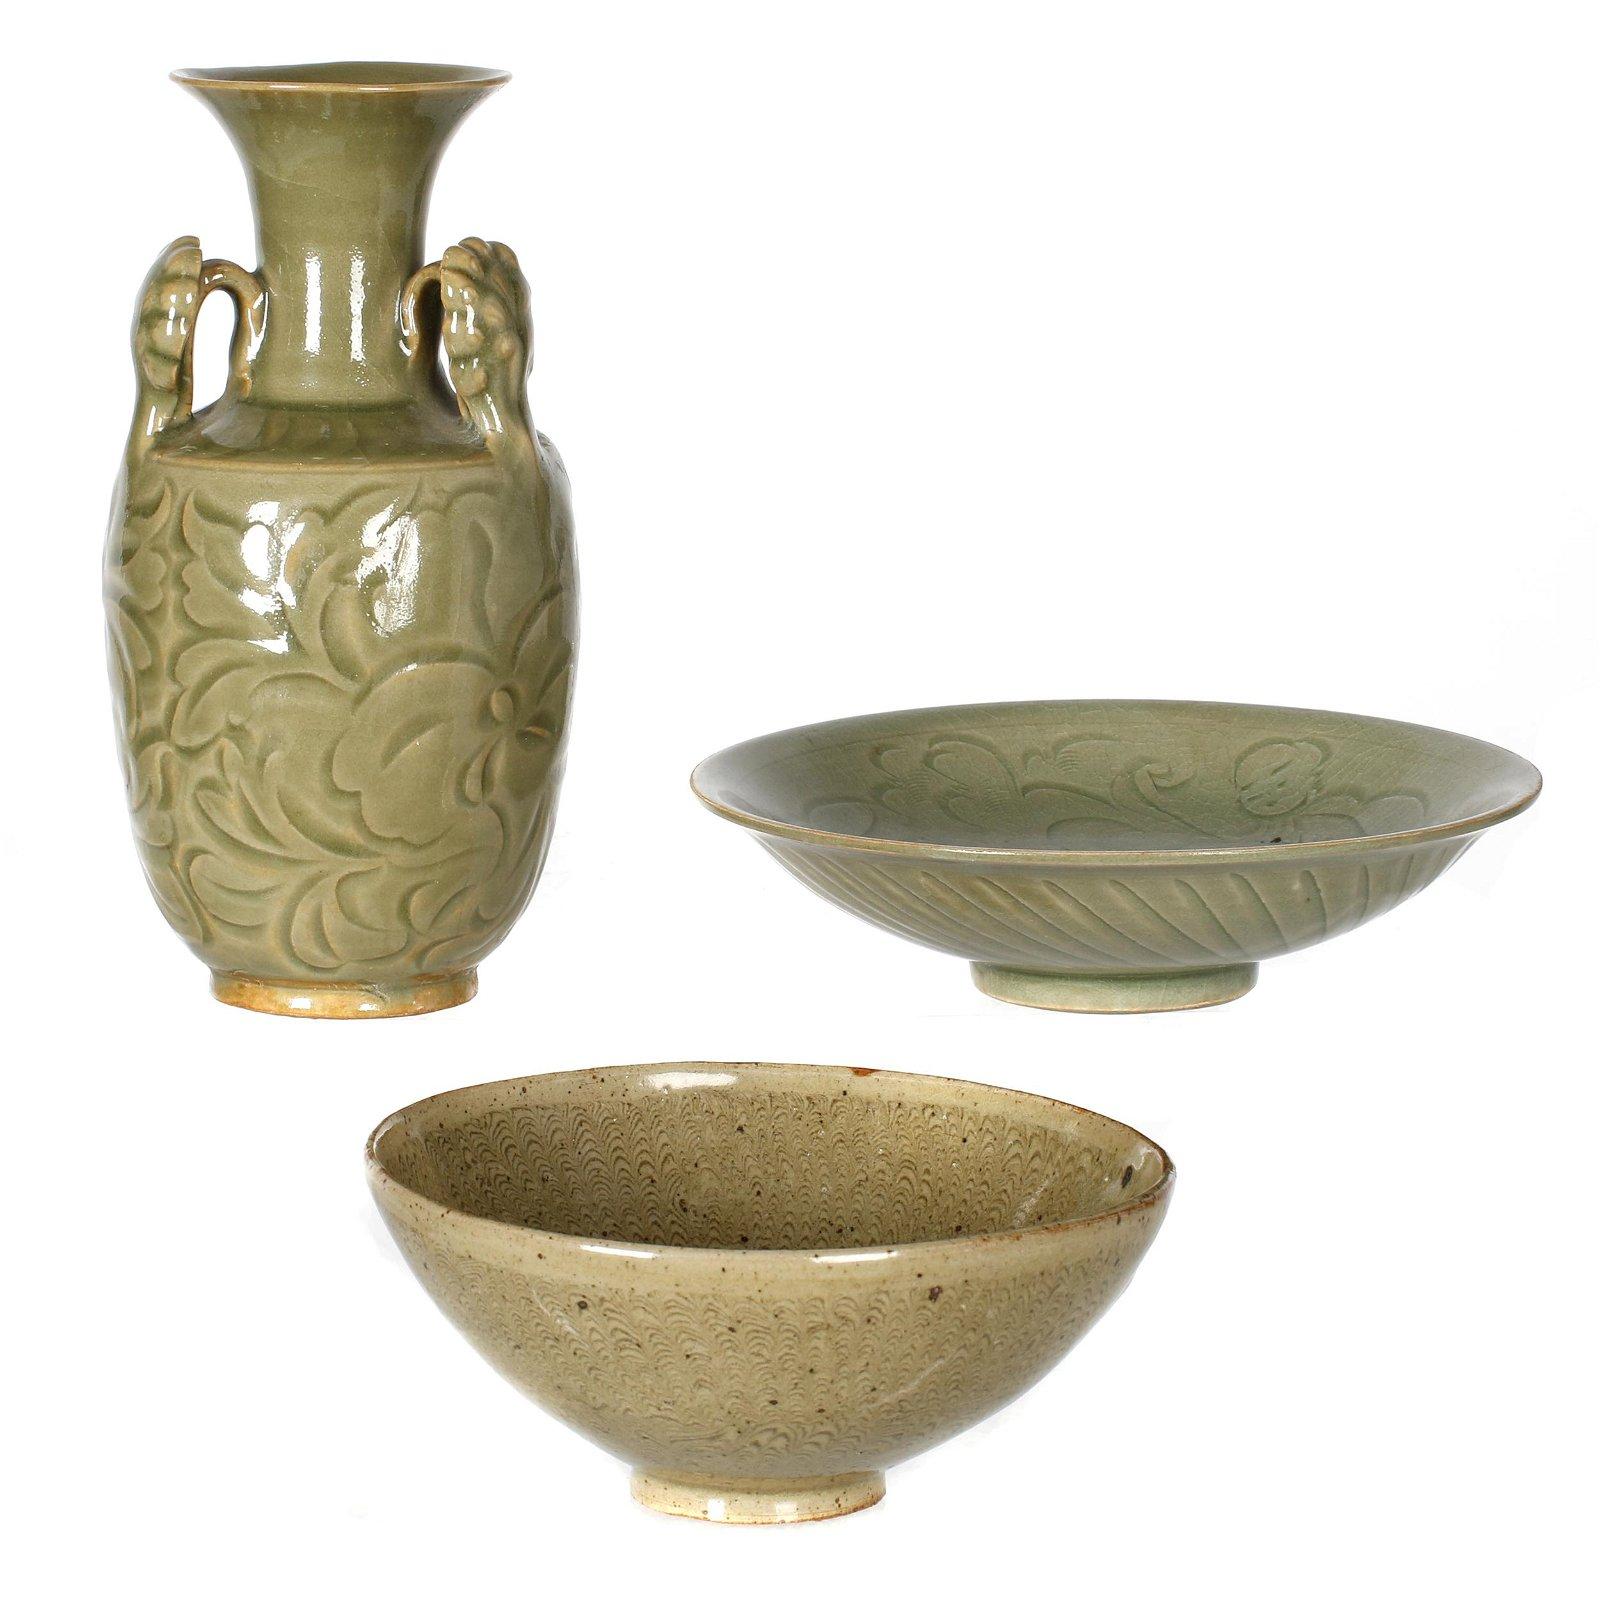 Three Yaozhou Glazed Ceramic Vessels, Song dynasty